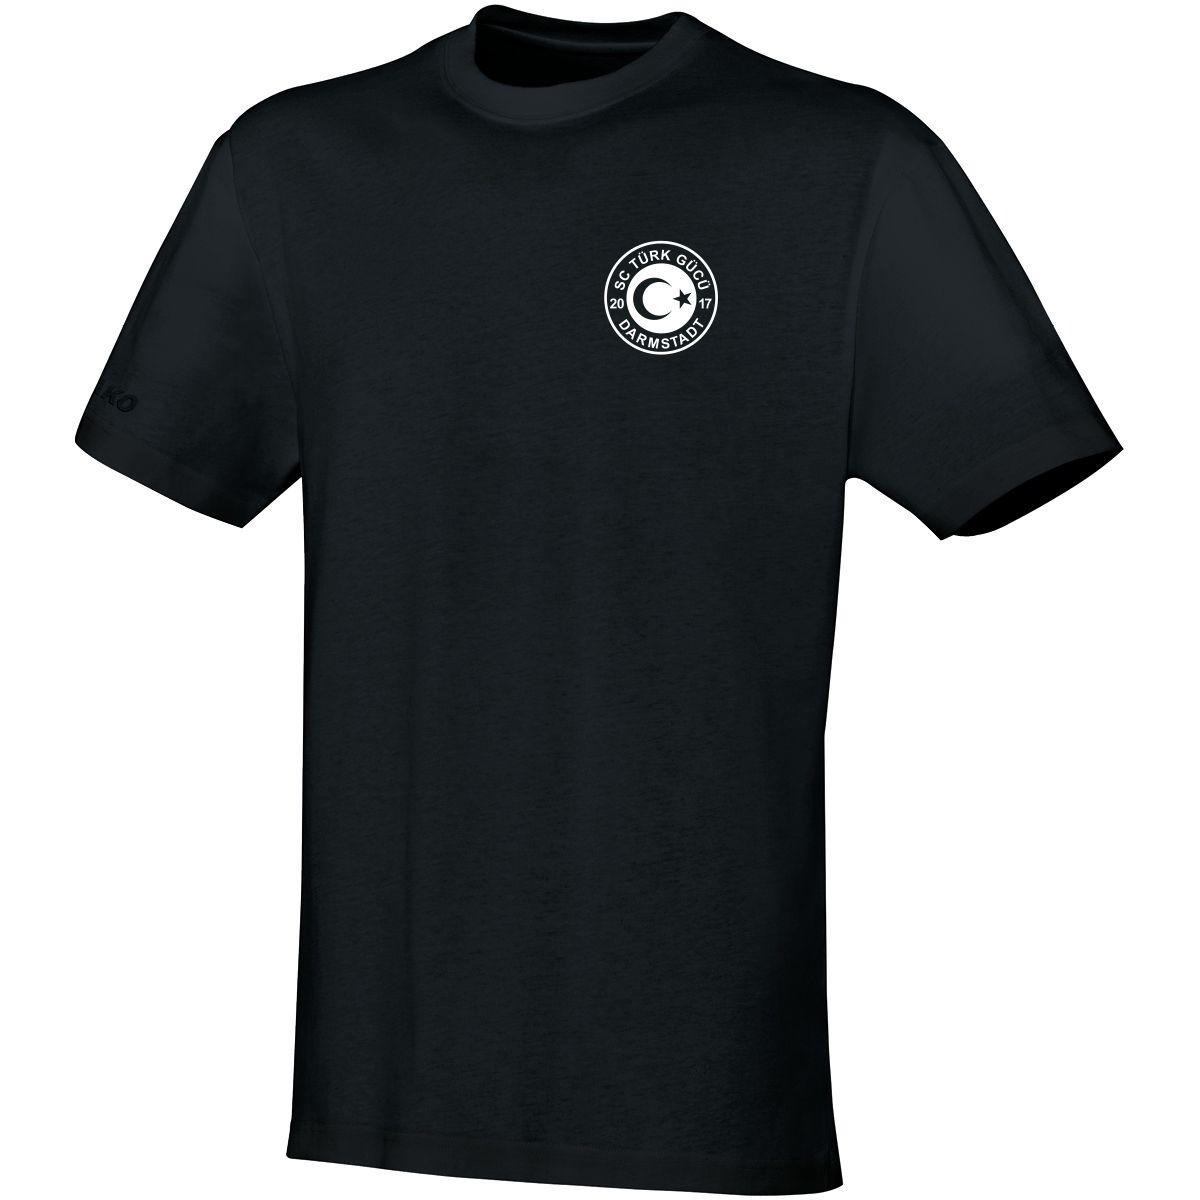 Fan T-Shirt Druck weiß oder